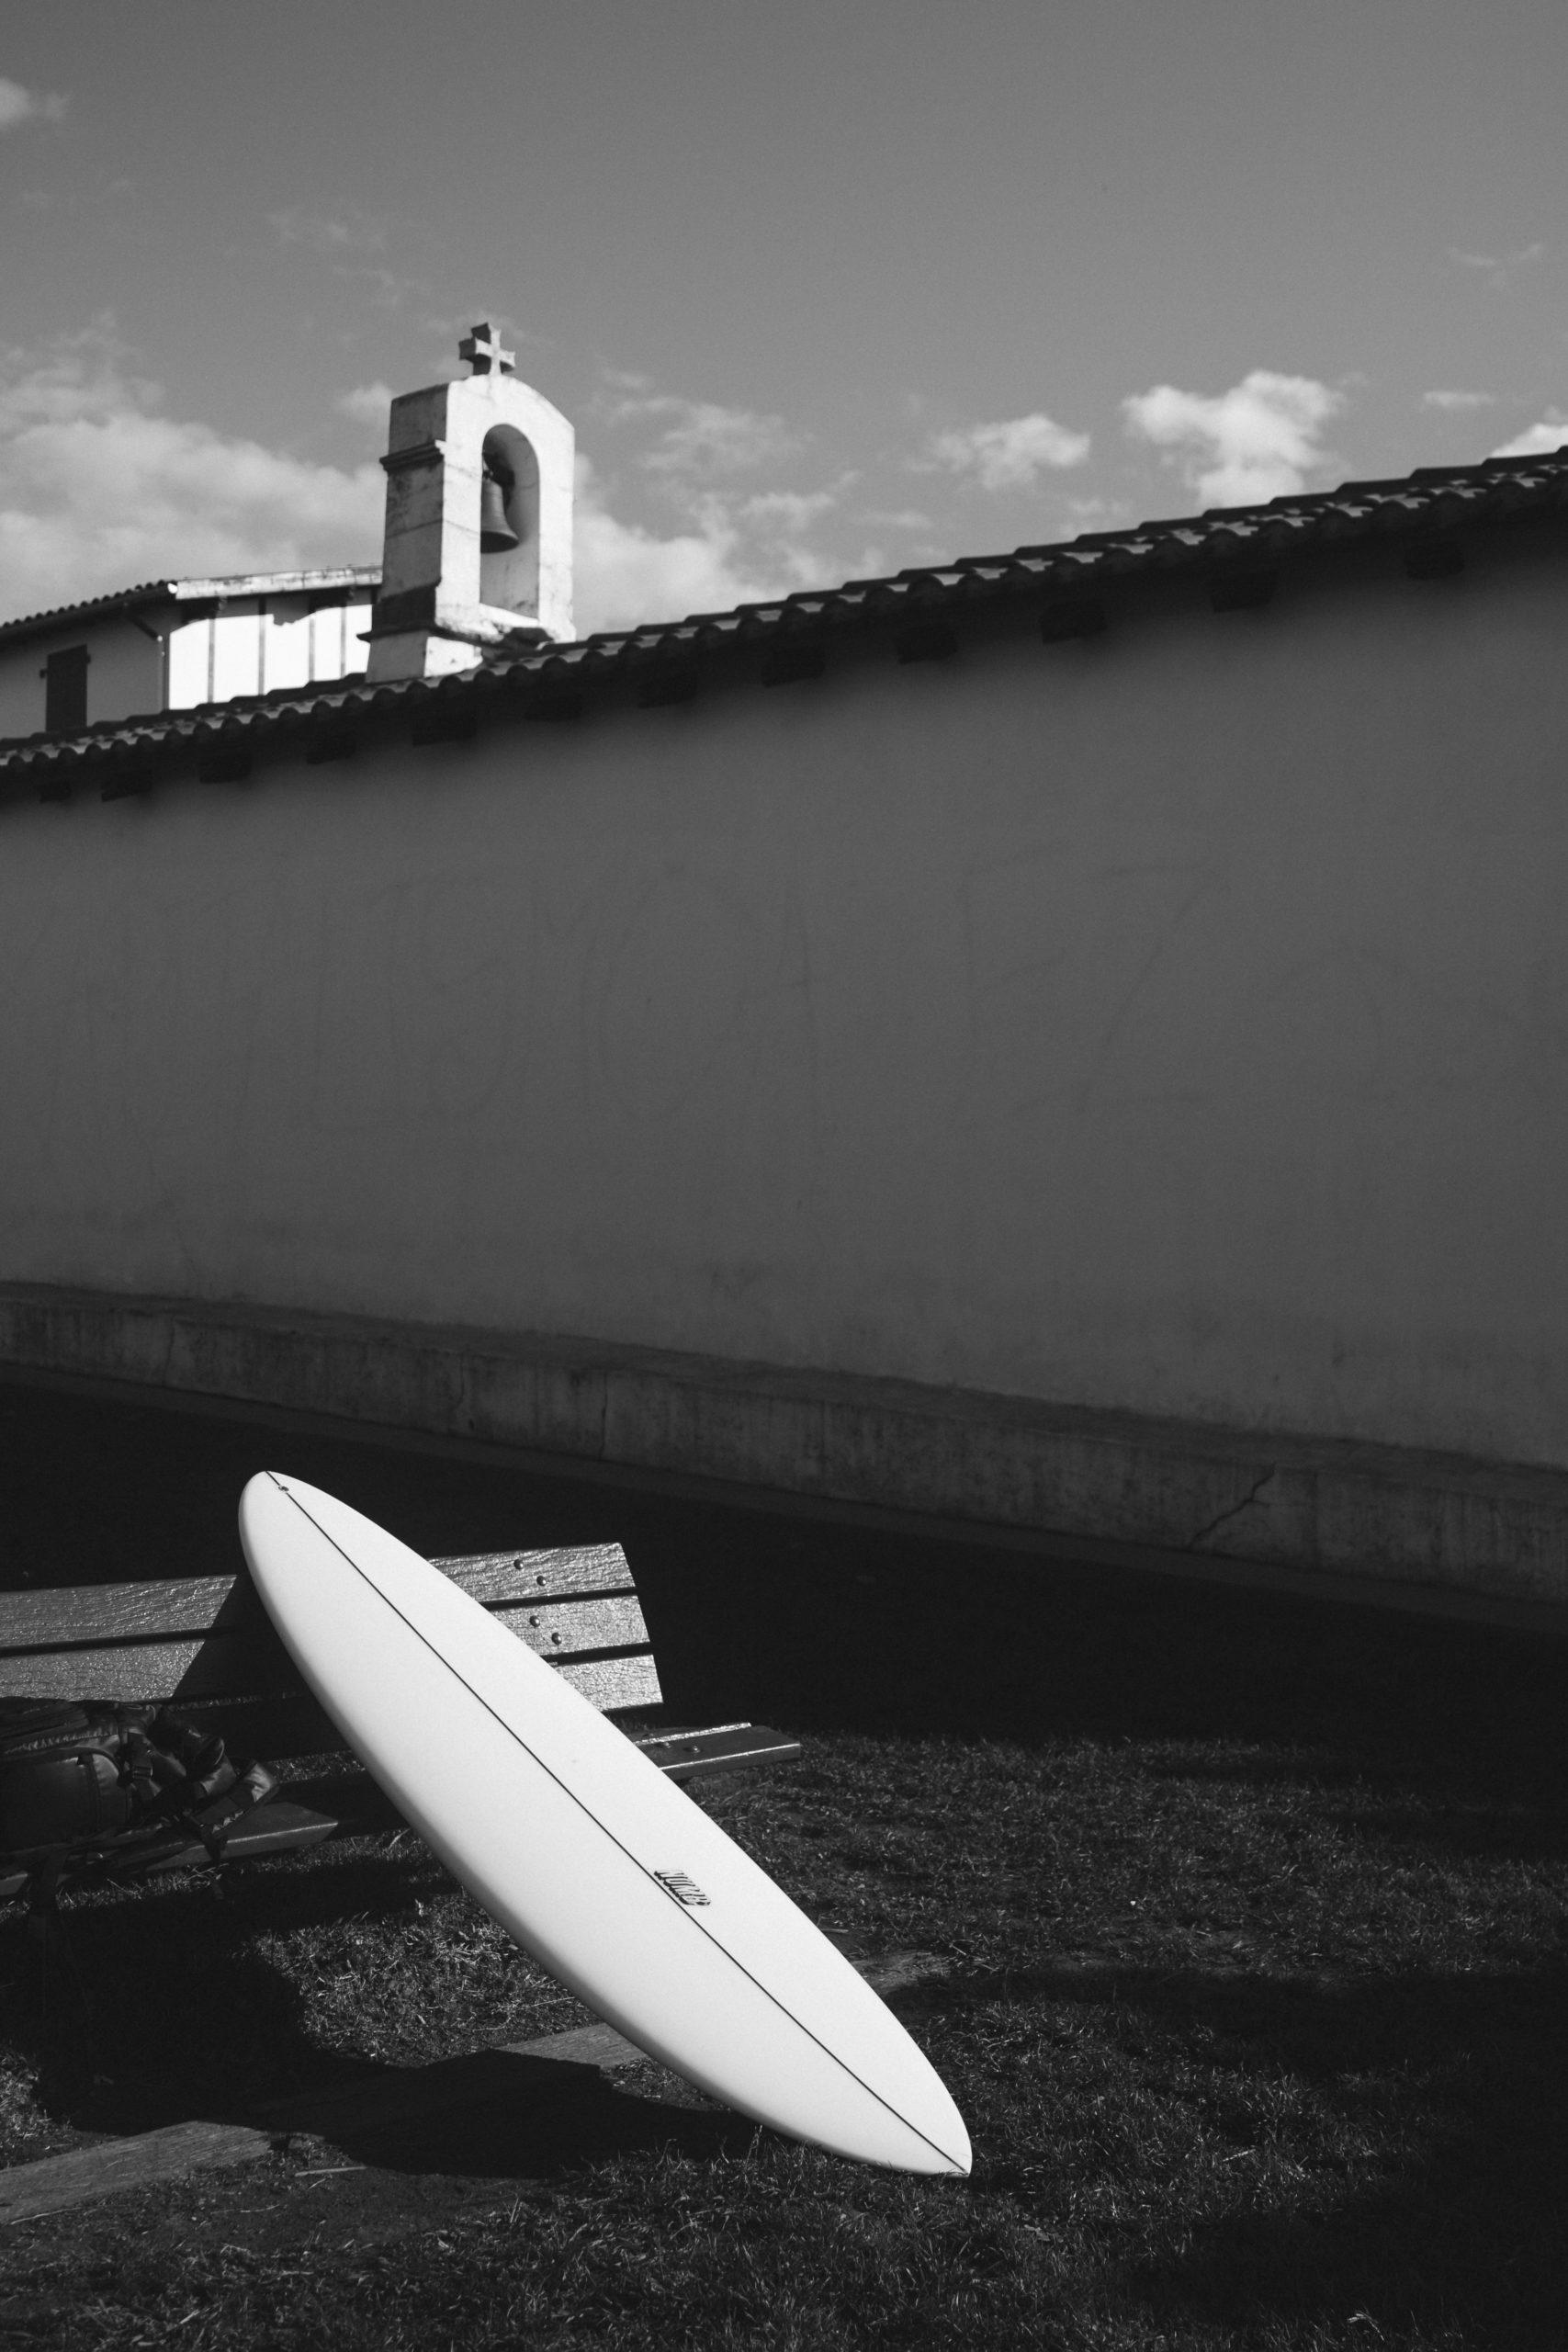 Numb Surfboards